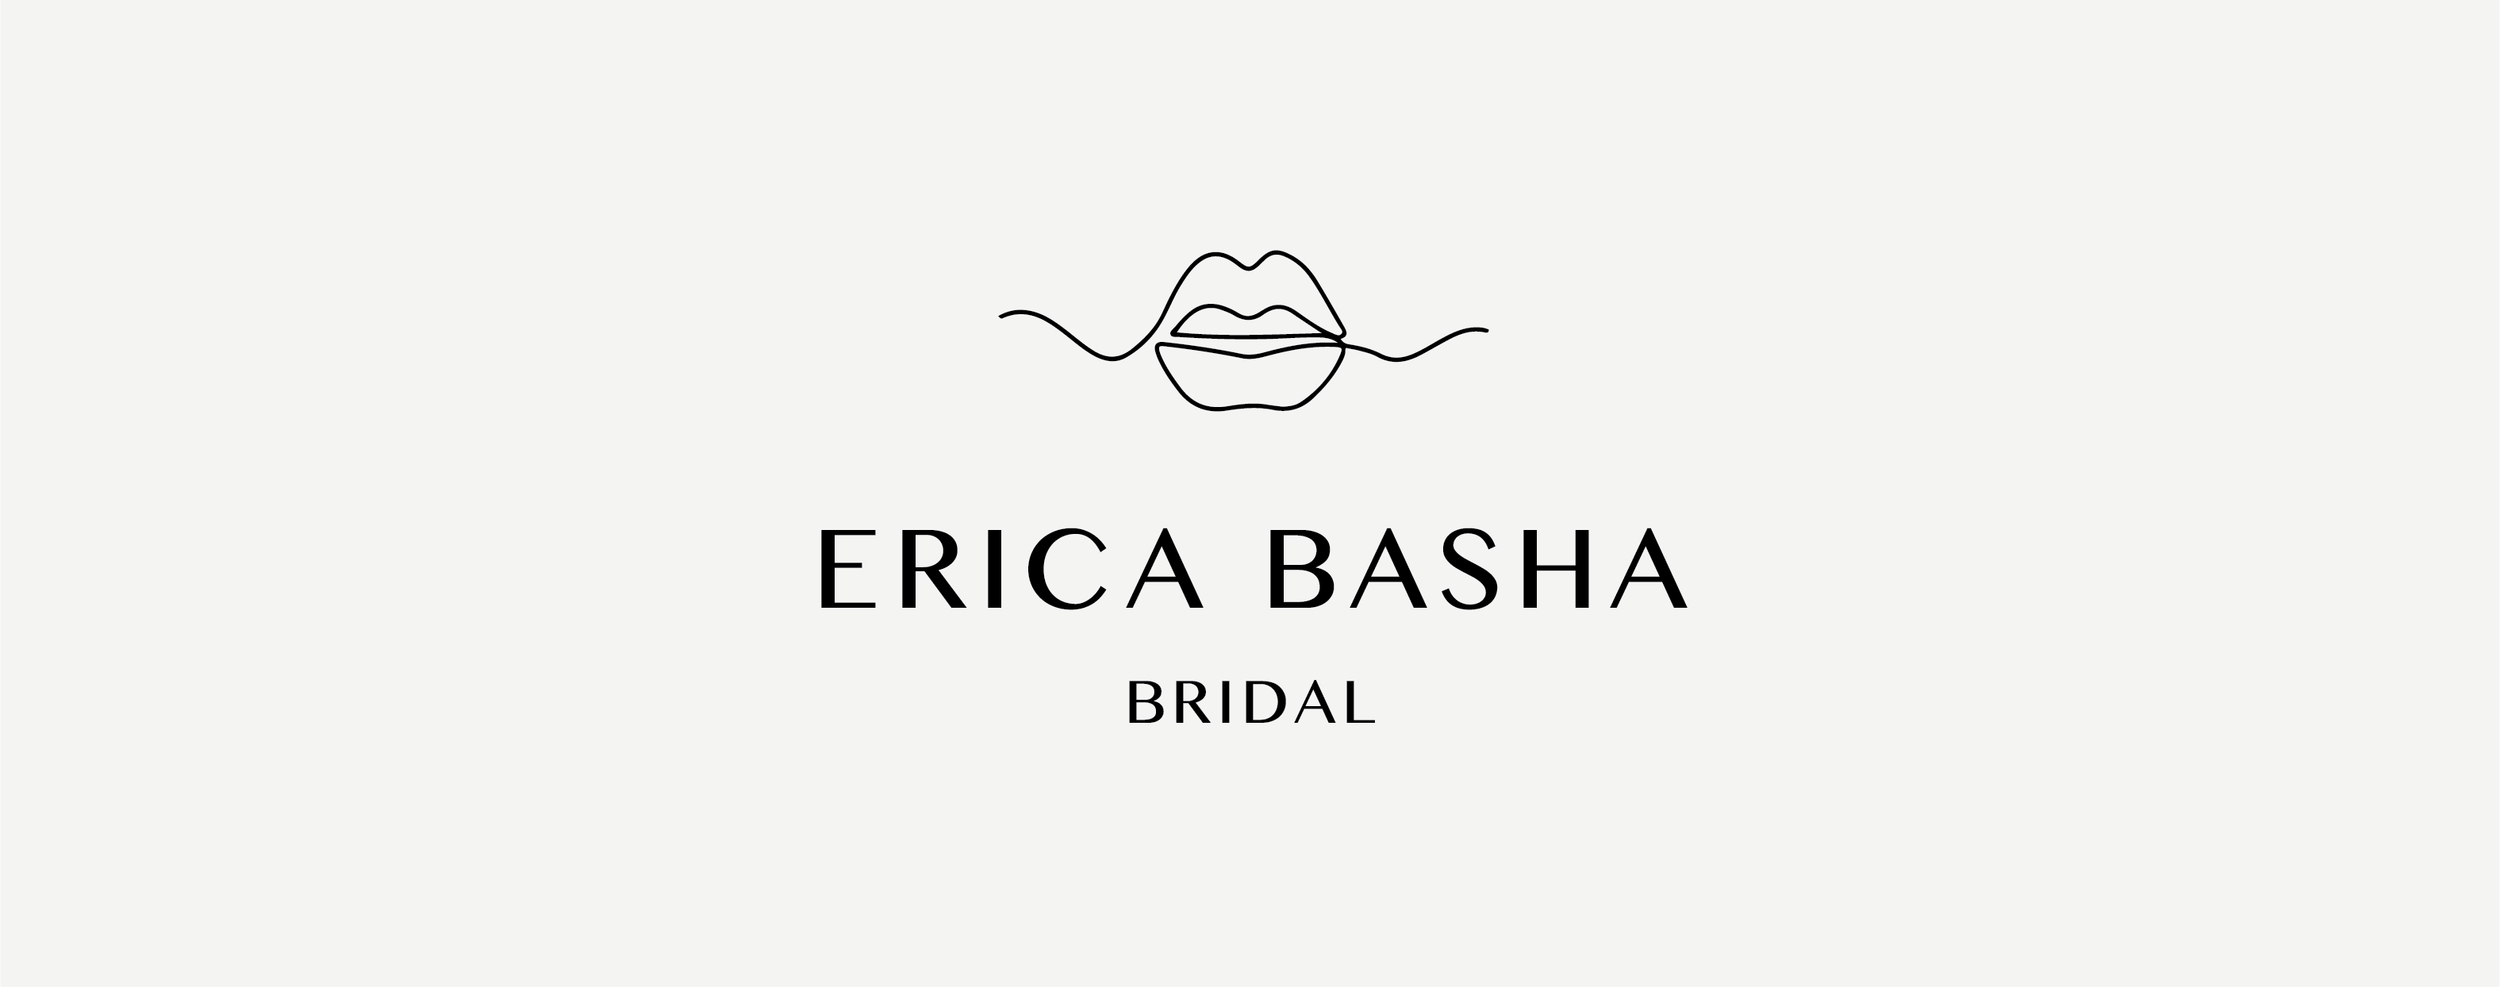 EB bridal logo.png